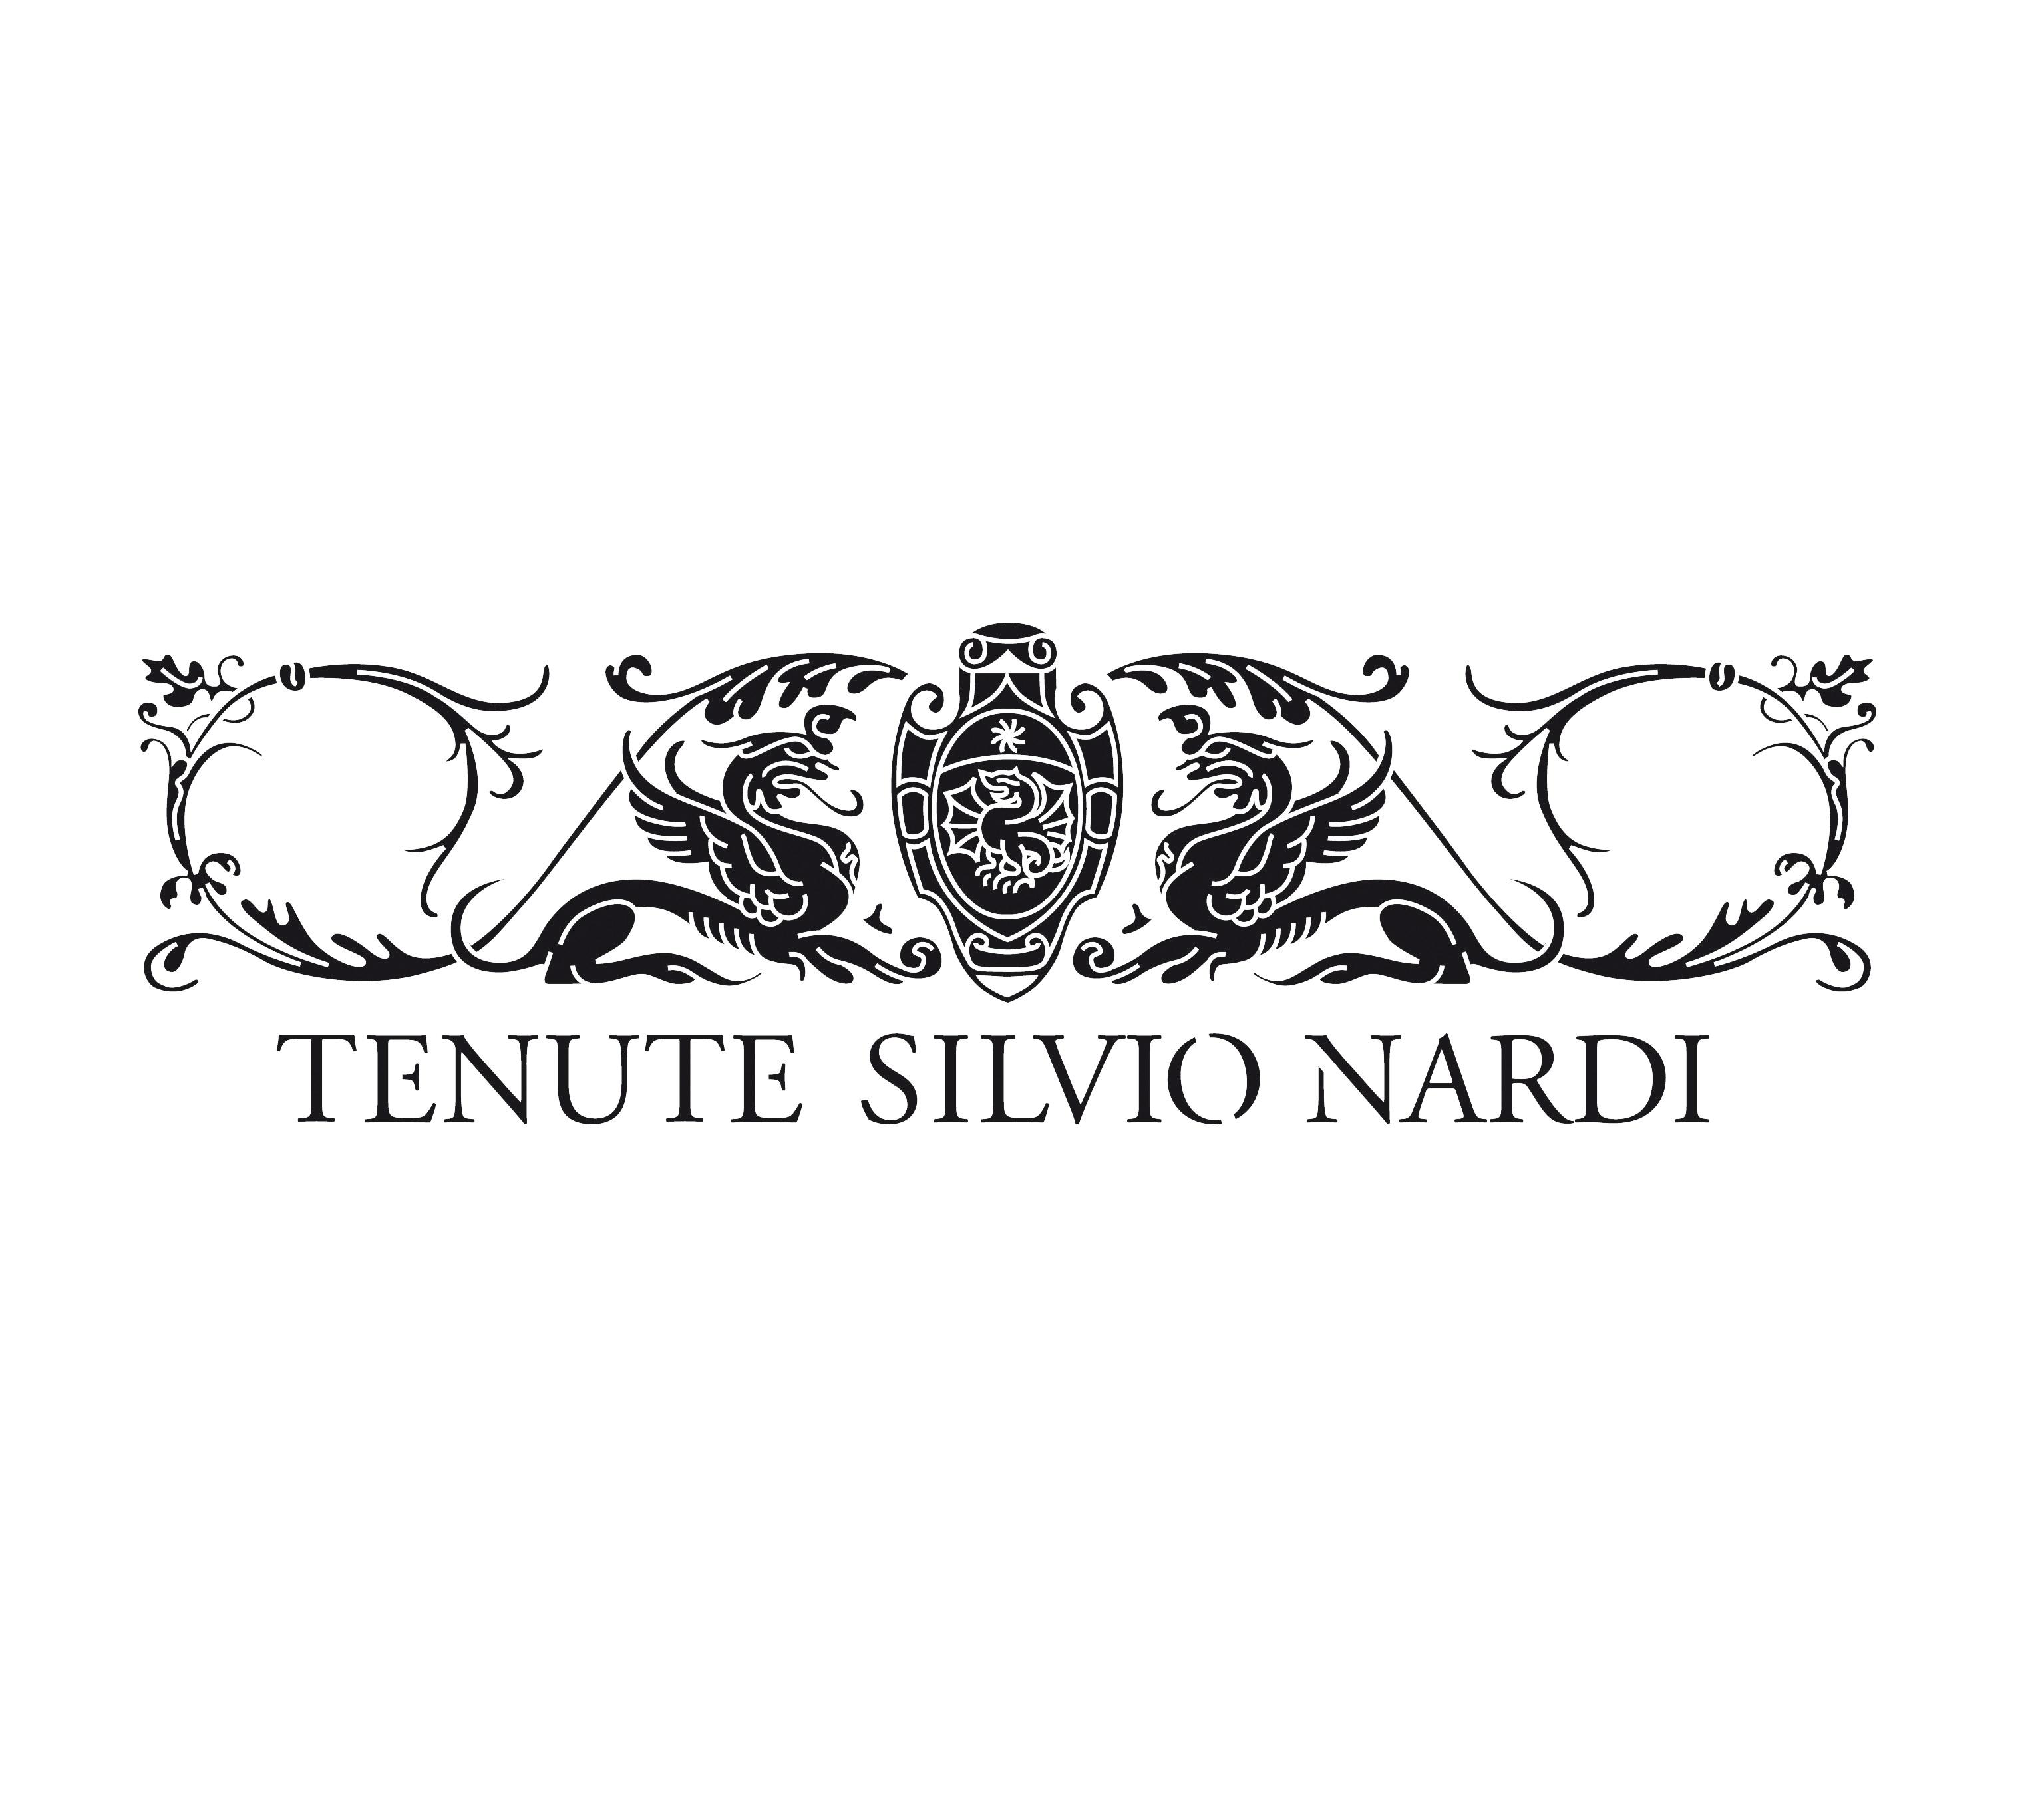 Tenute Silvio Nardi